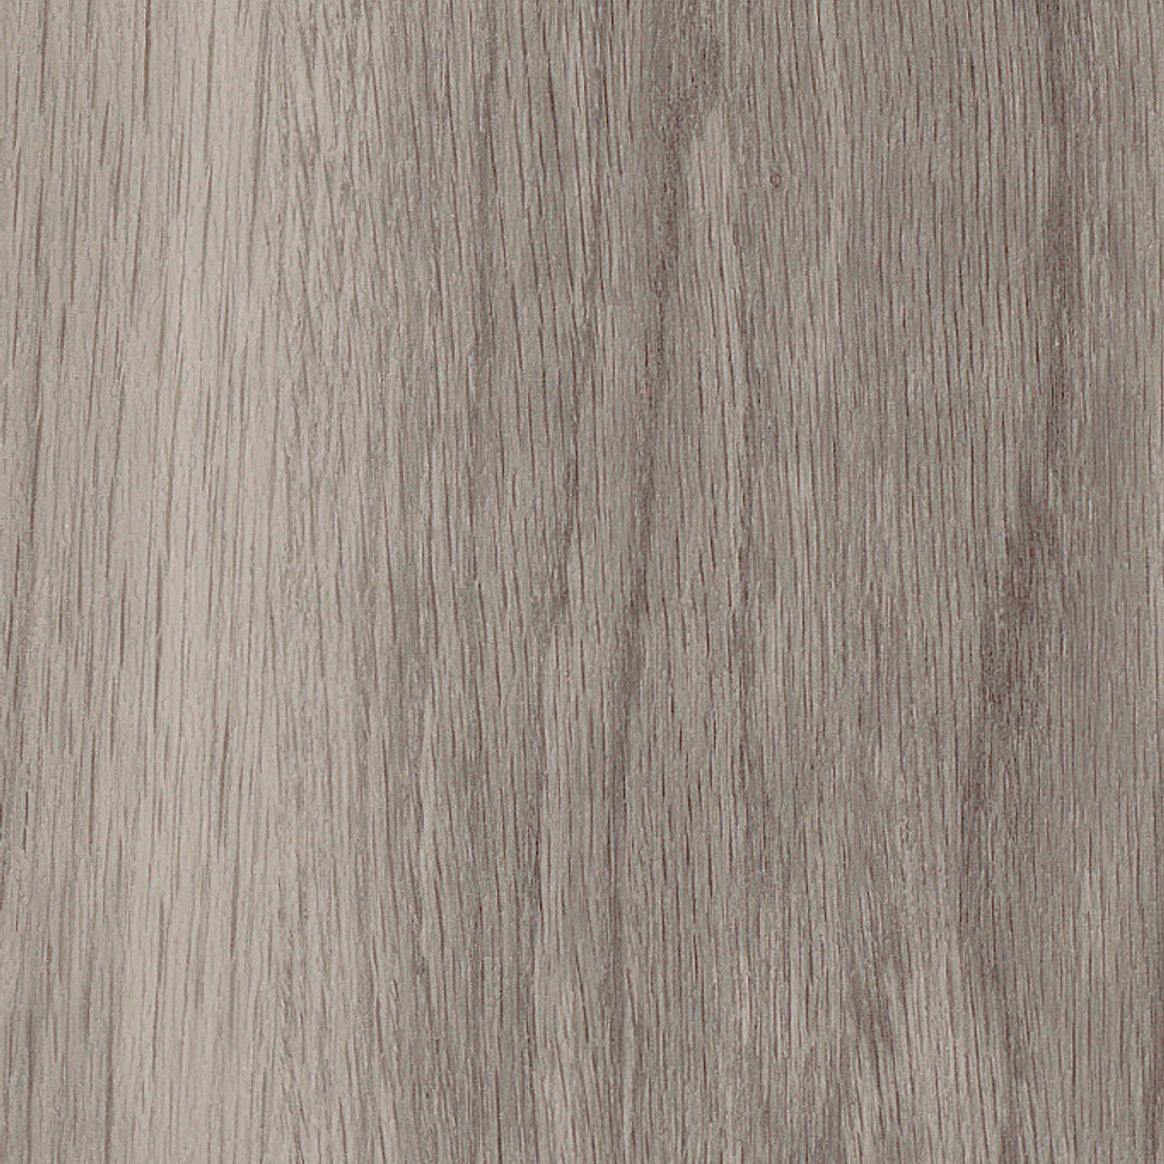 Nordic Oak tile